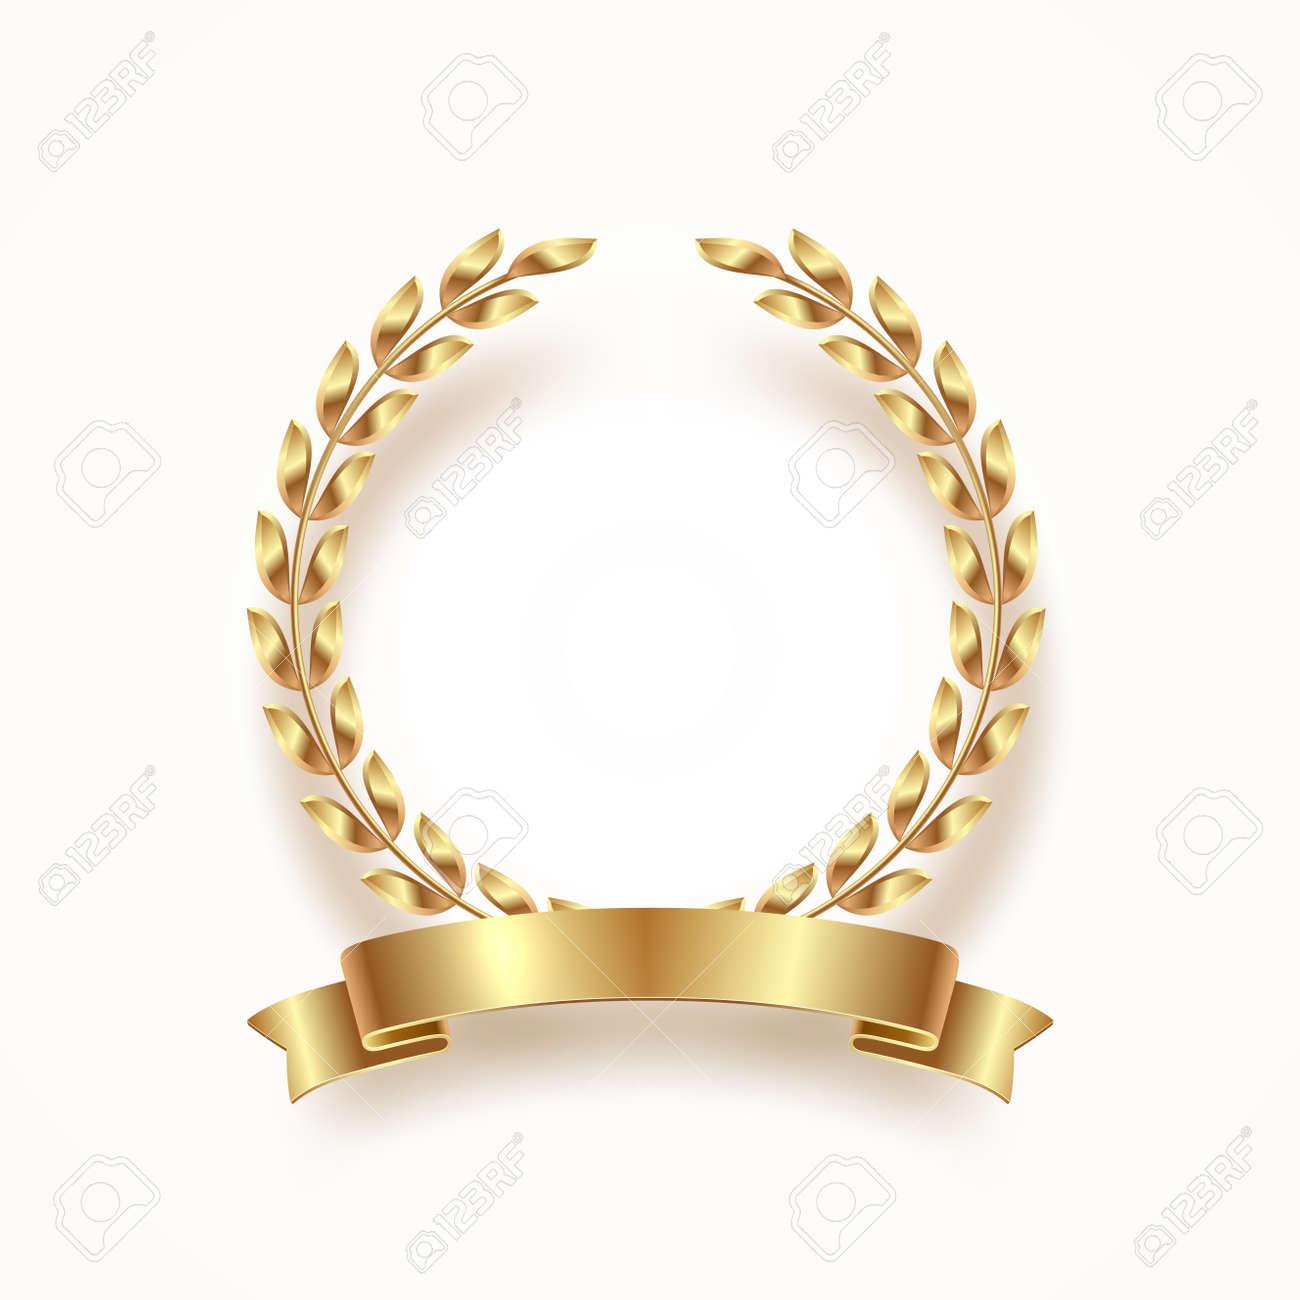 Golden laurel wreath with ribbon. Vector illustration. - 99486783